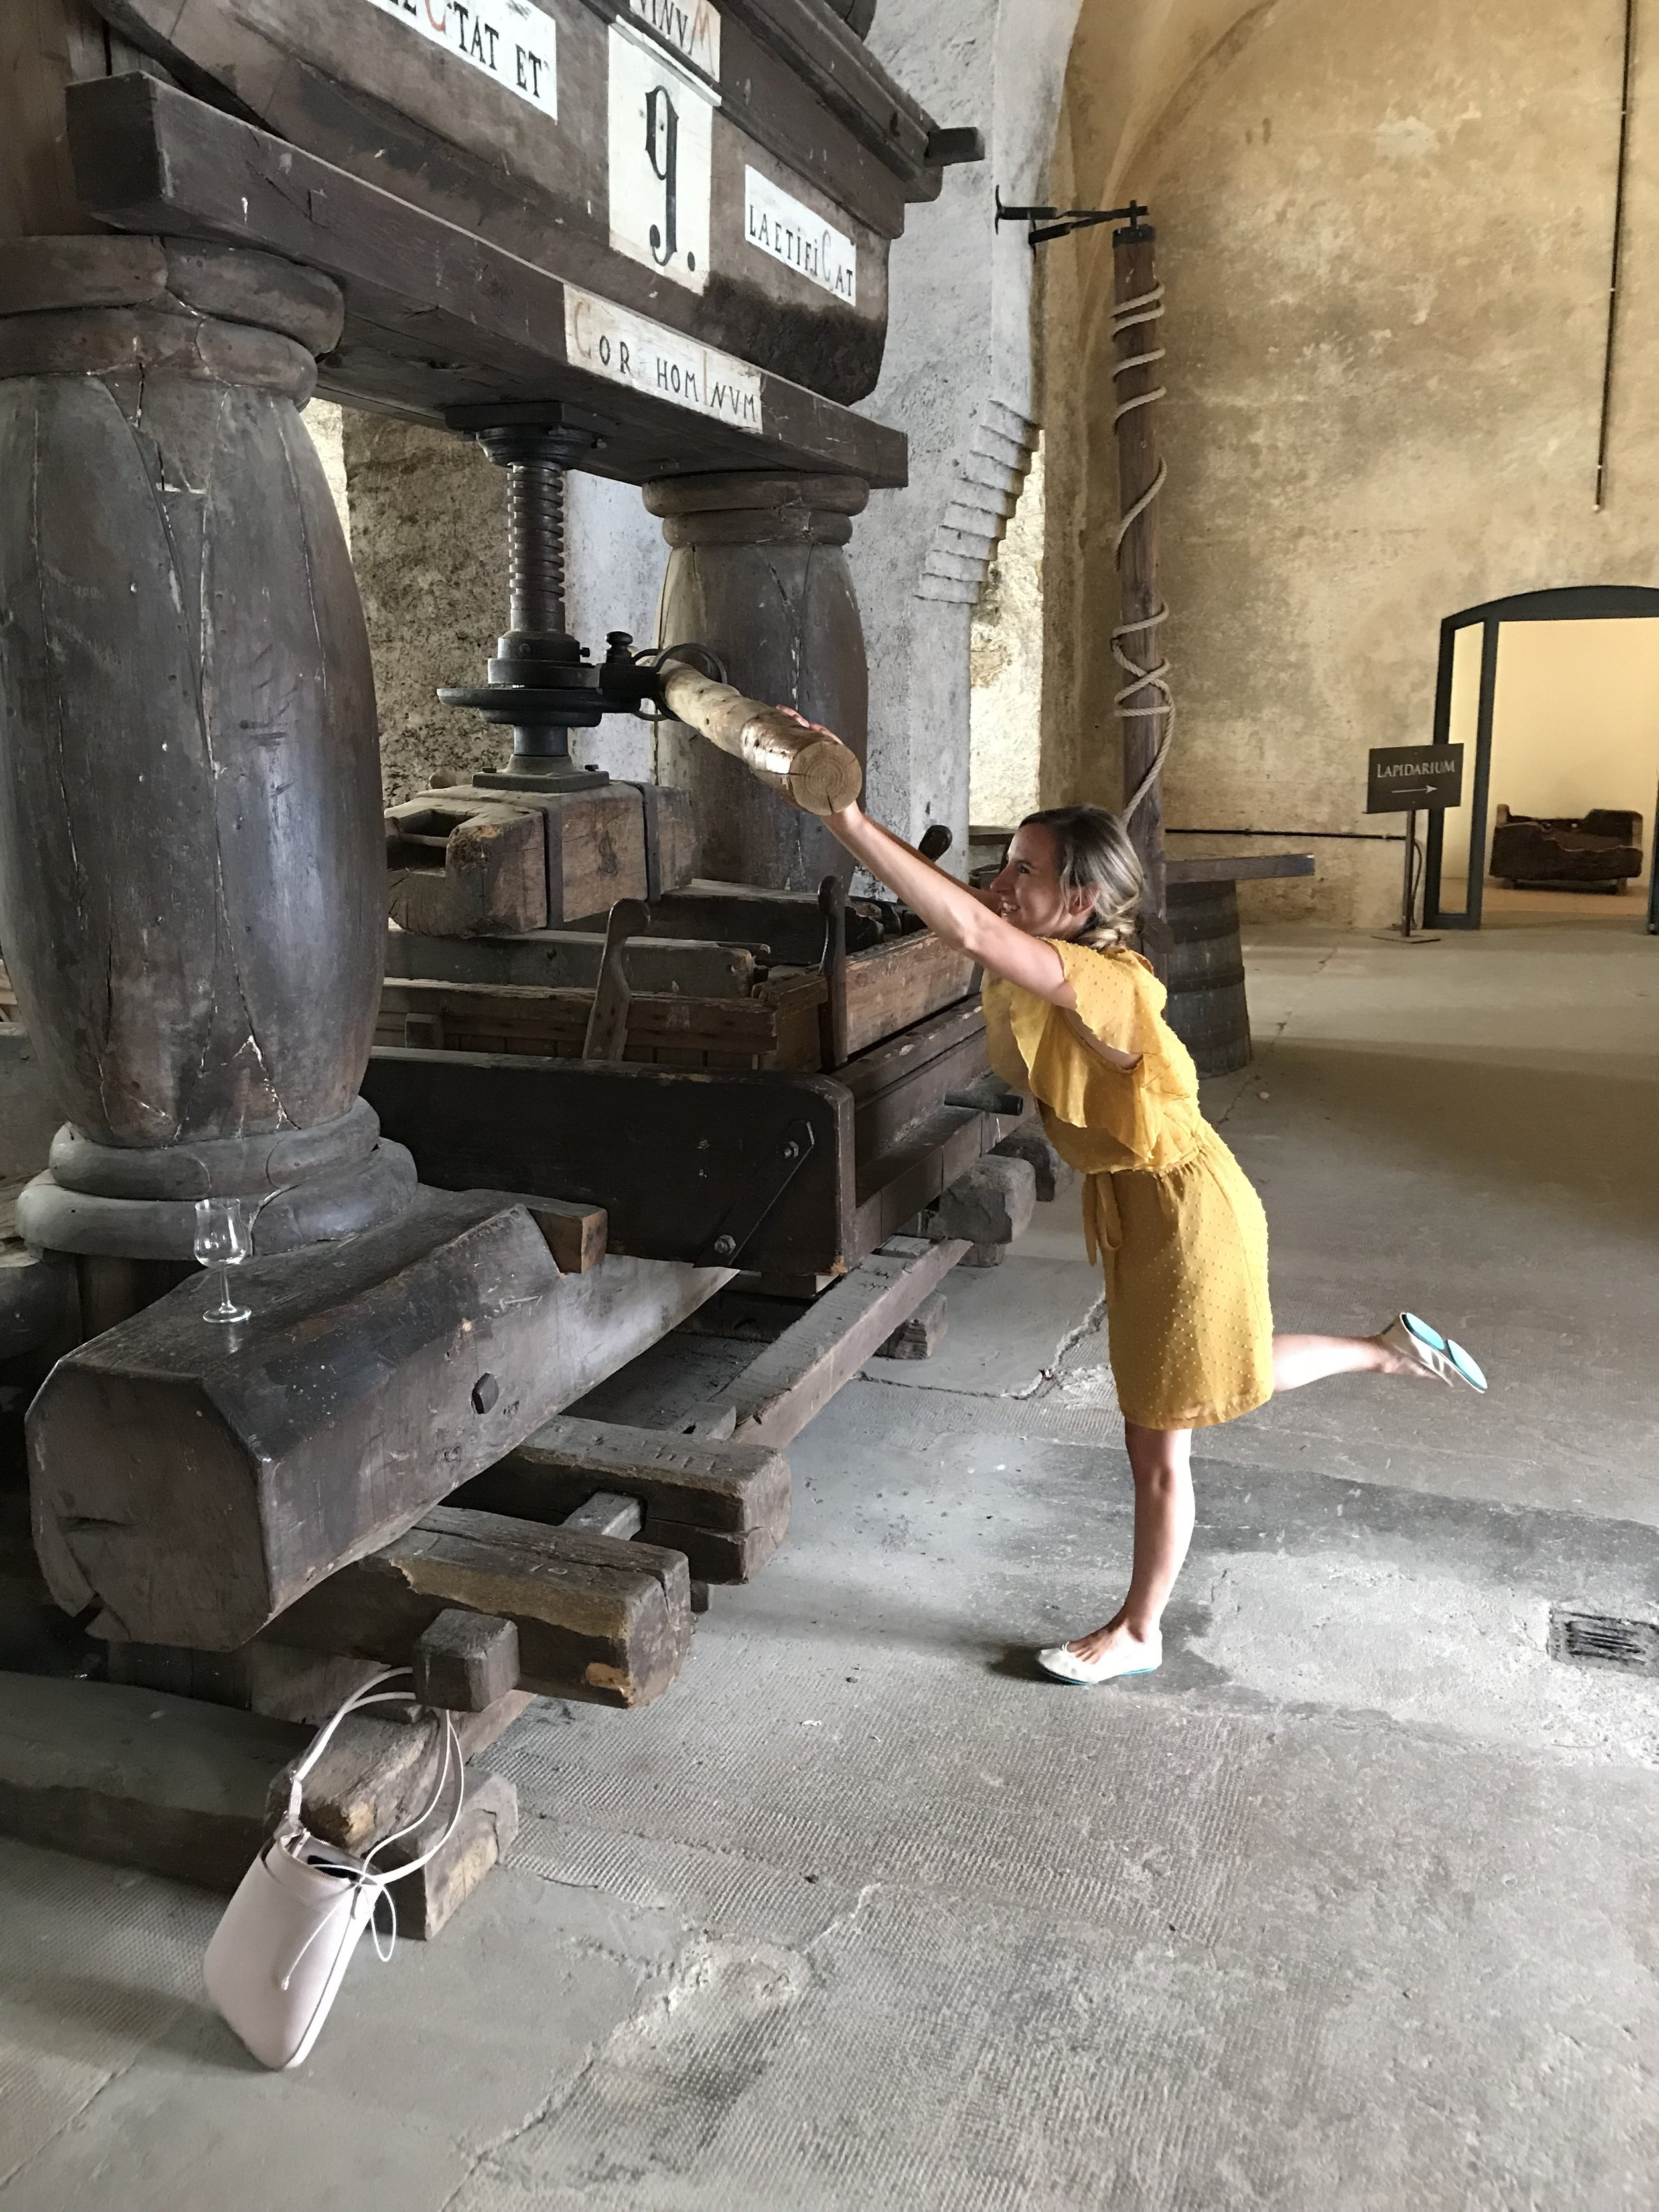 Kloster Eberbach press room.jpg